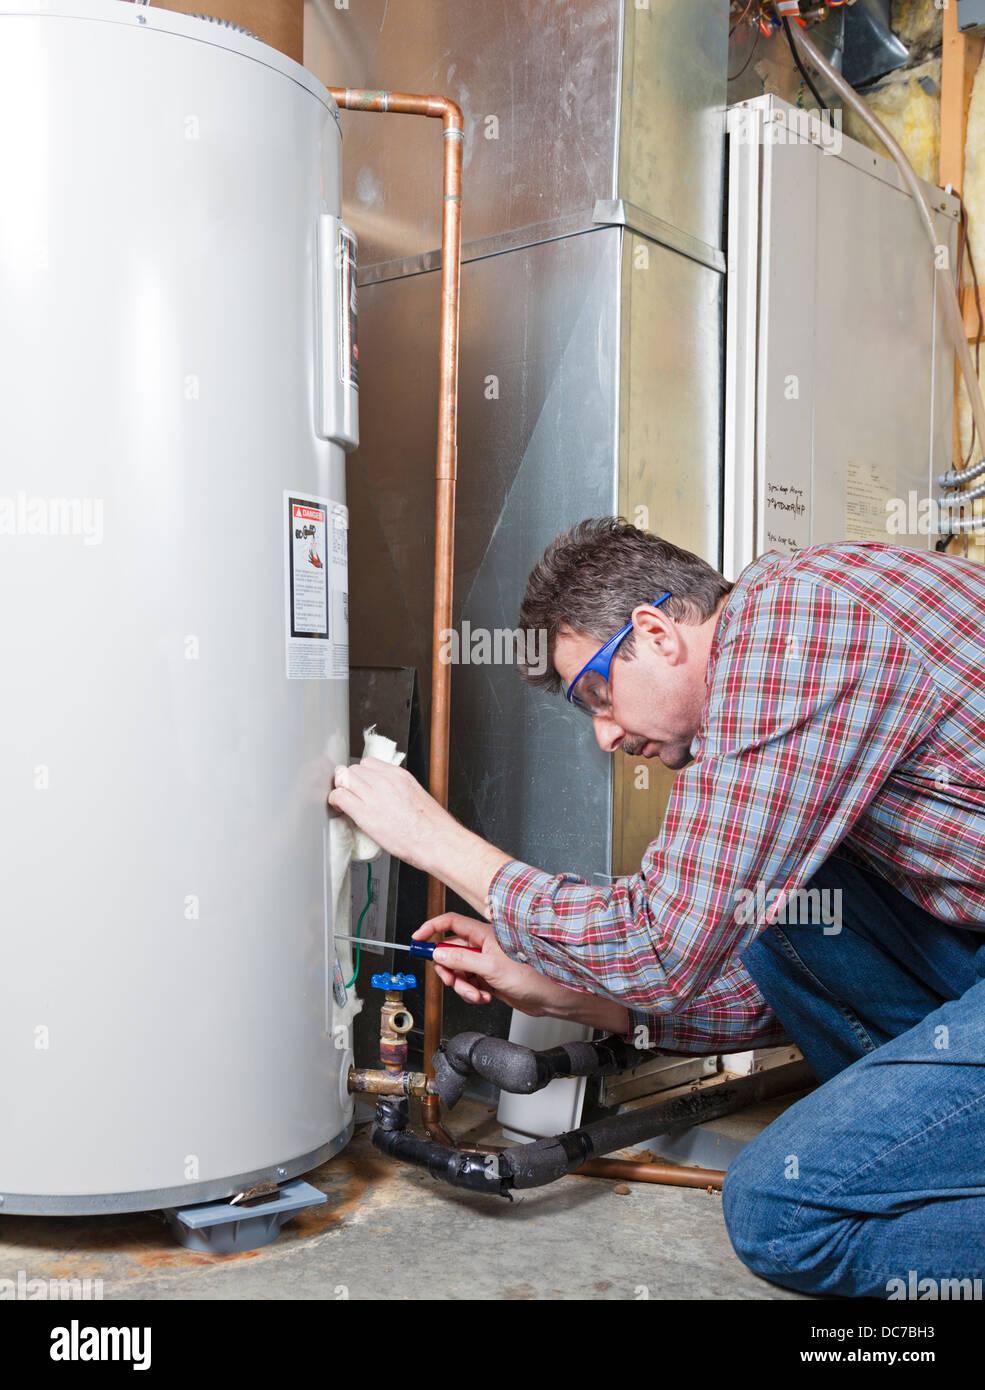 Water heater maintenance - Stock Image